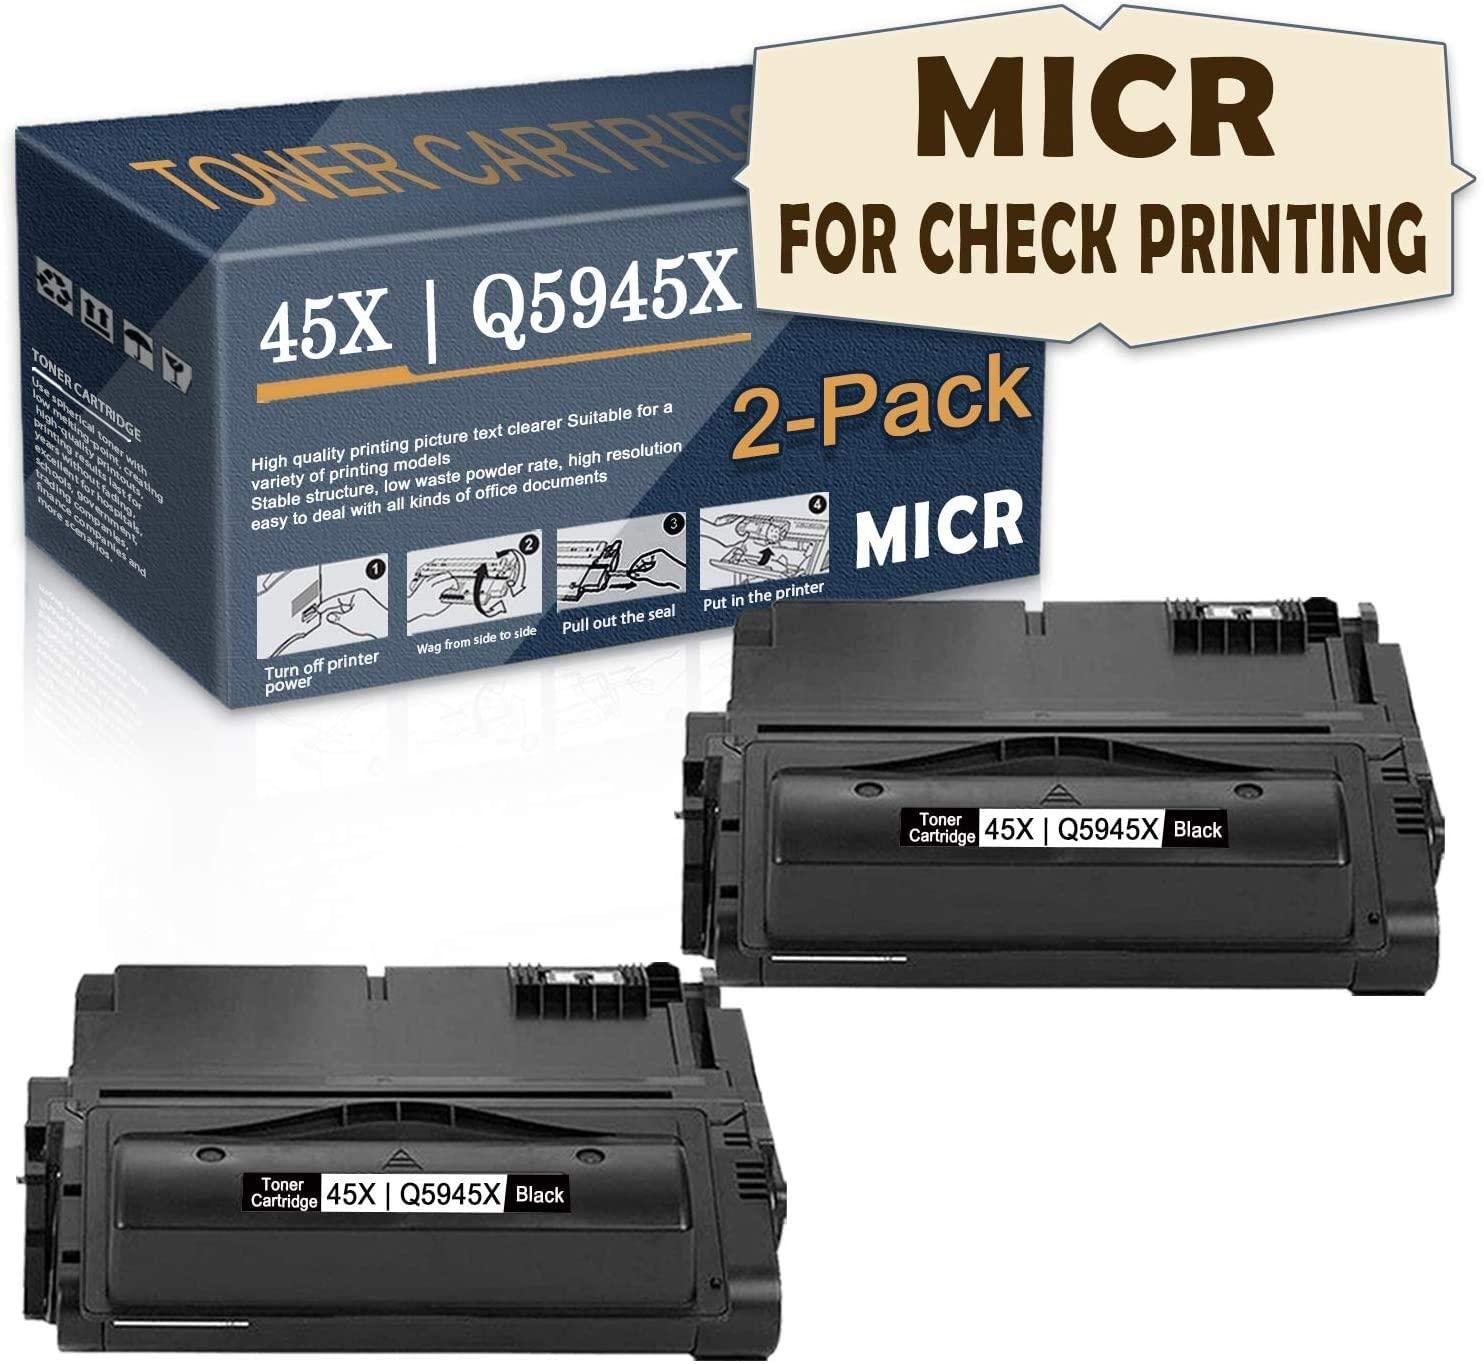 2-Pack ofBlack high Yield 45X Compatible 45X | Q5945X MICRToner Cartridge(MICR for Check Printing) Replacementfor HP Laserjet 4200TN 4250tn 4250 4200 4300tn 4200dtn 4250n 4300n Printer,bySatink.